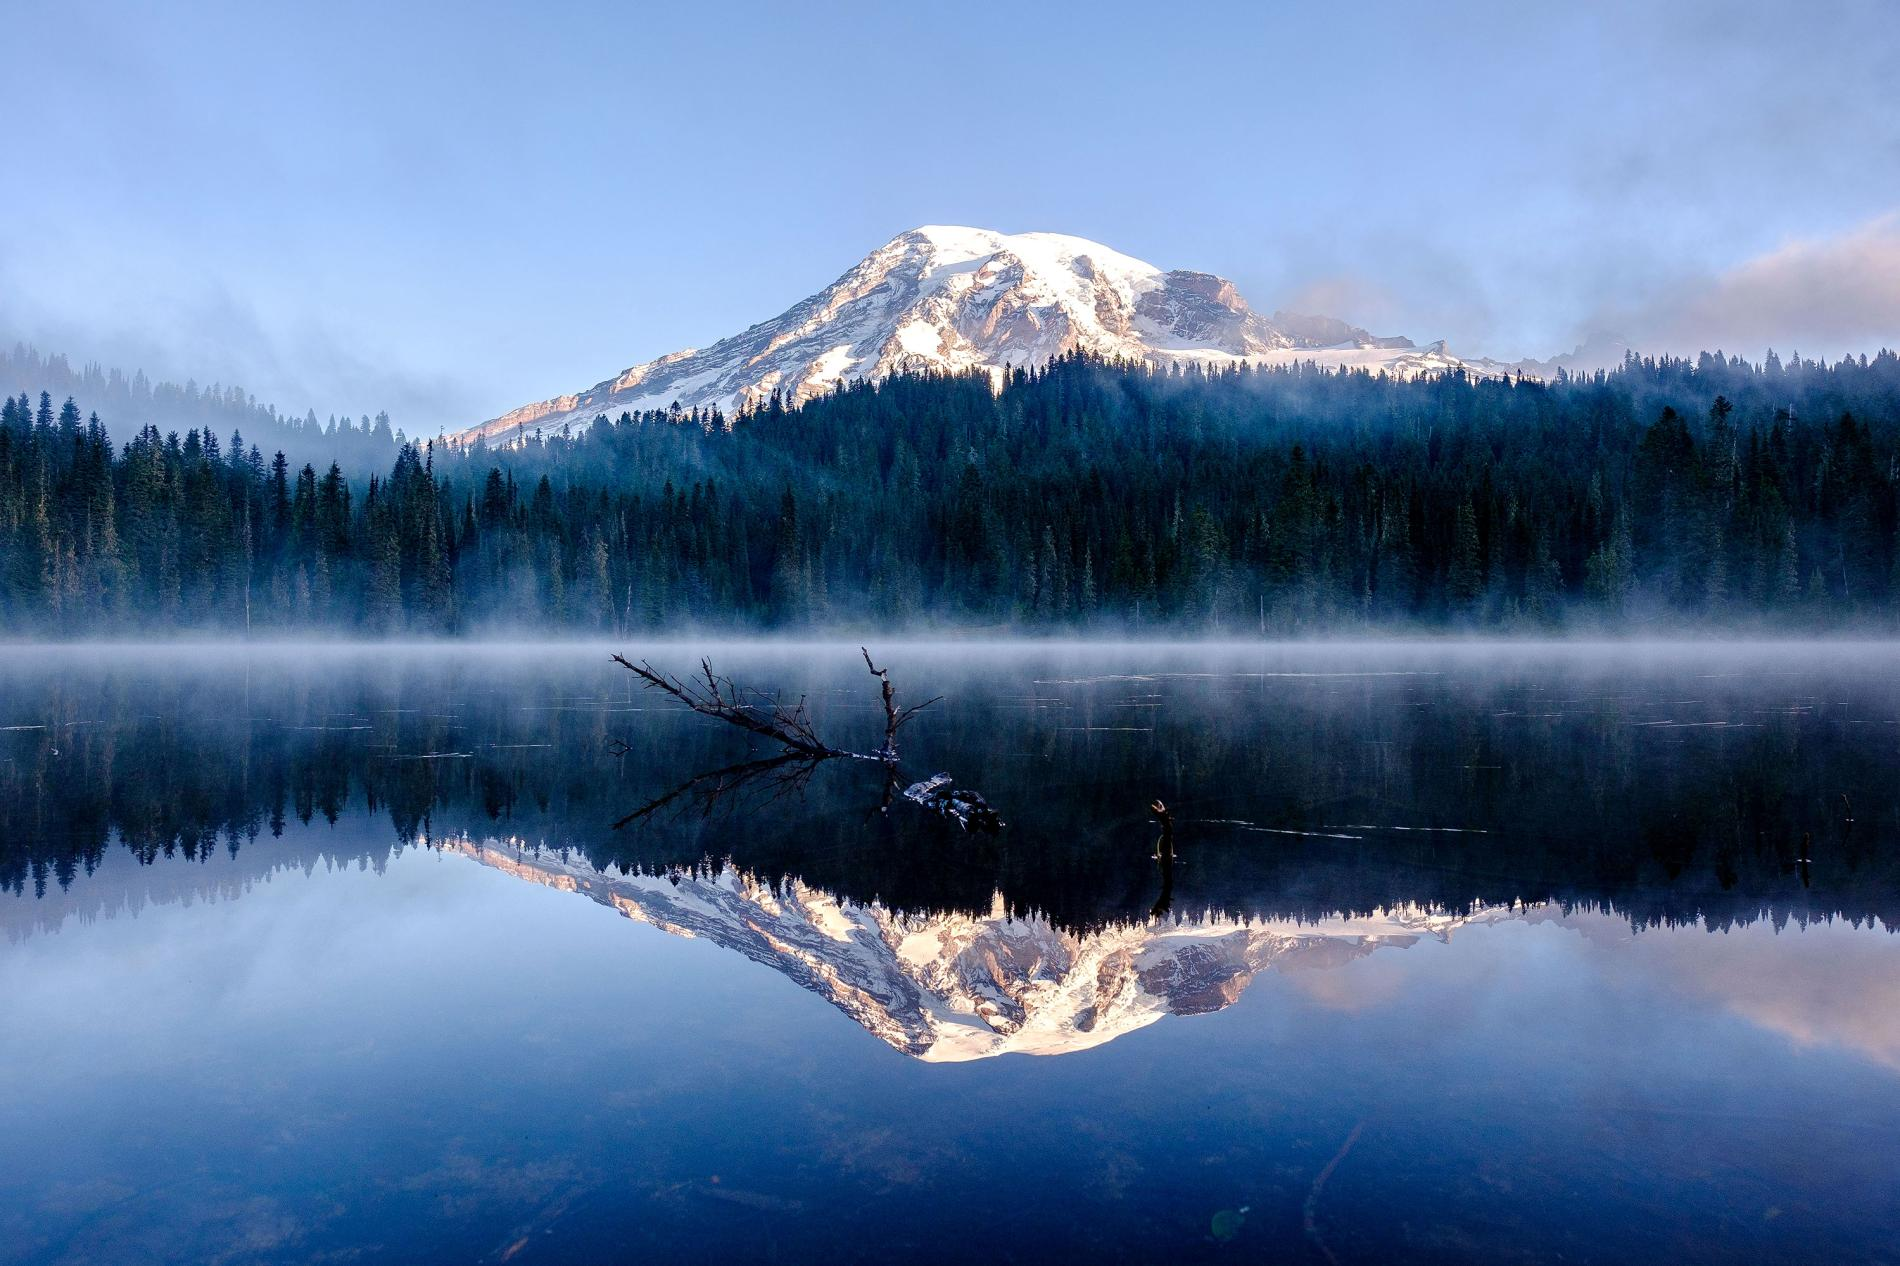 mount-rainier-national-park-mount-rainier.adapt.1900.1.jpg